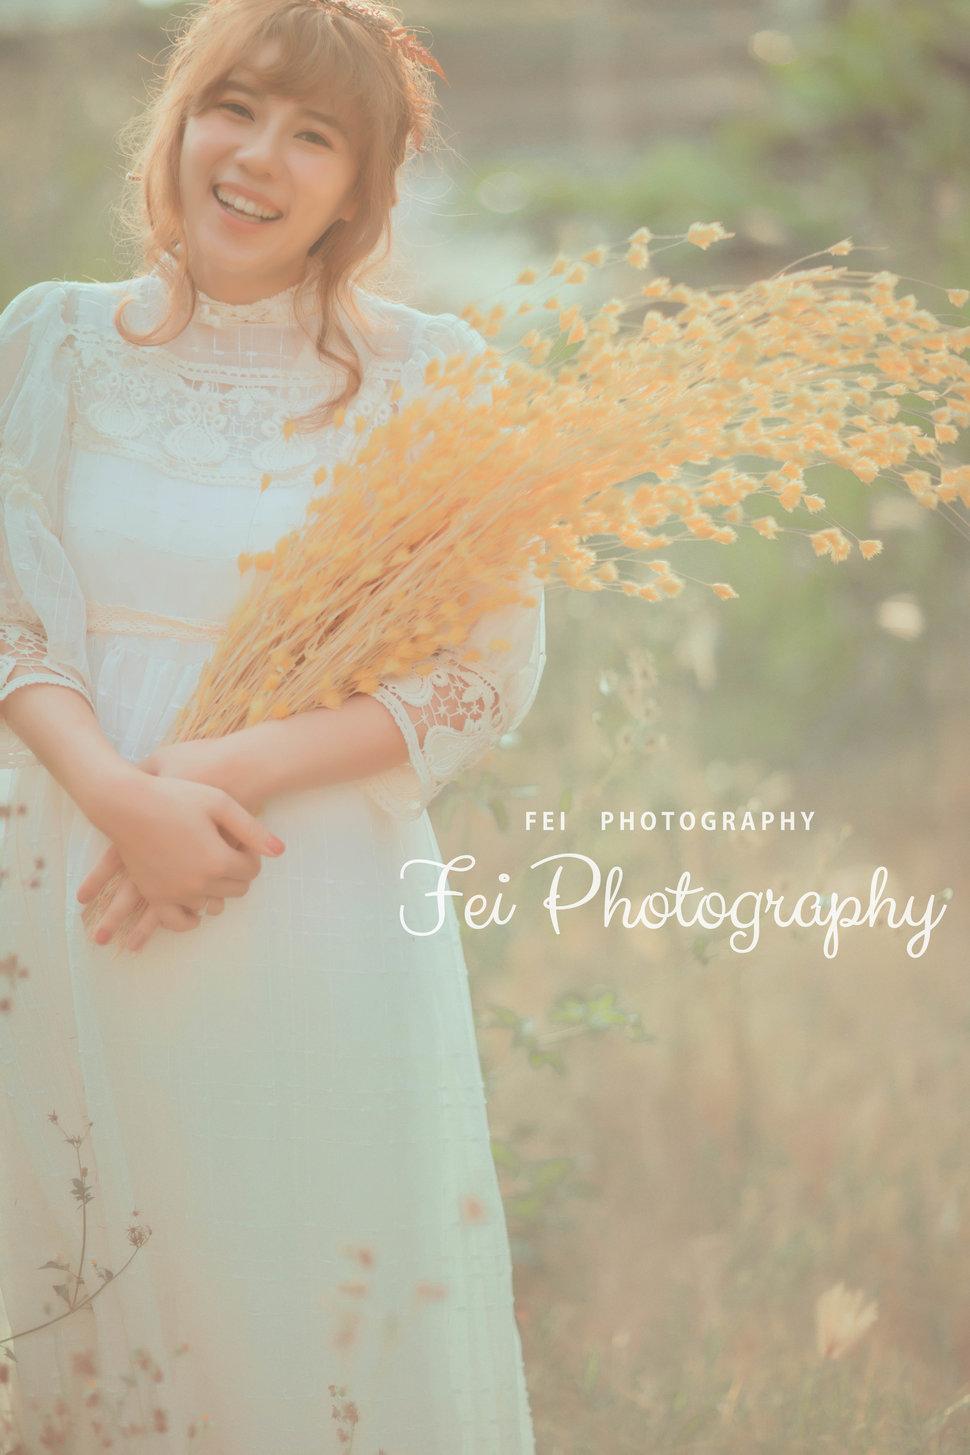 30 - 飛妃 Photography/女攝影師《結婚吧》